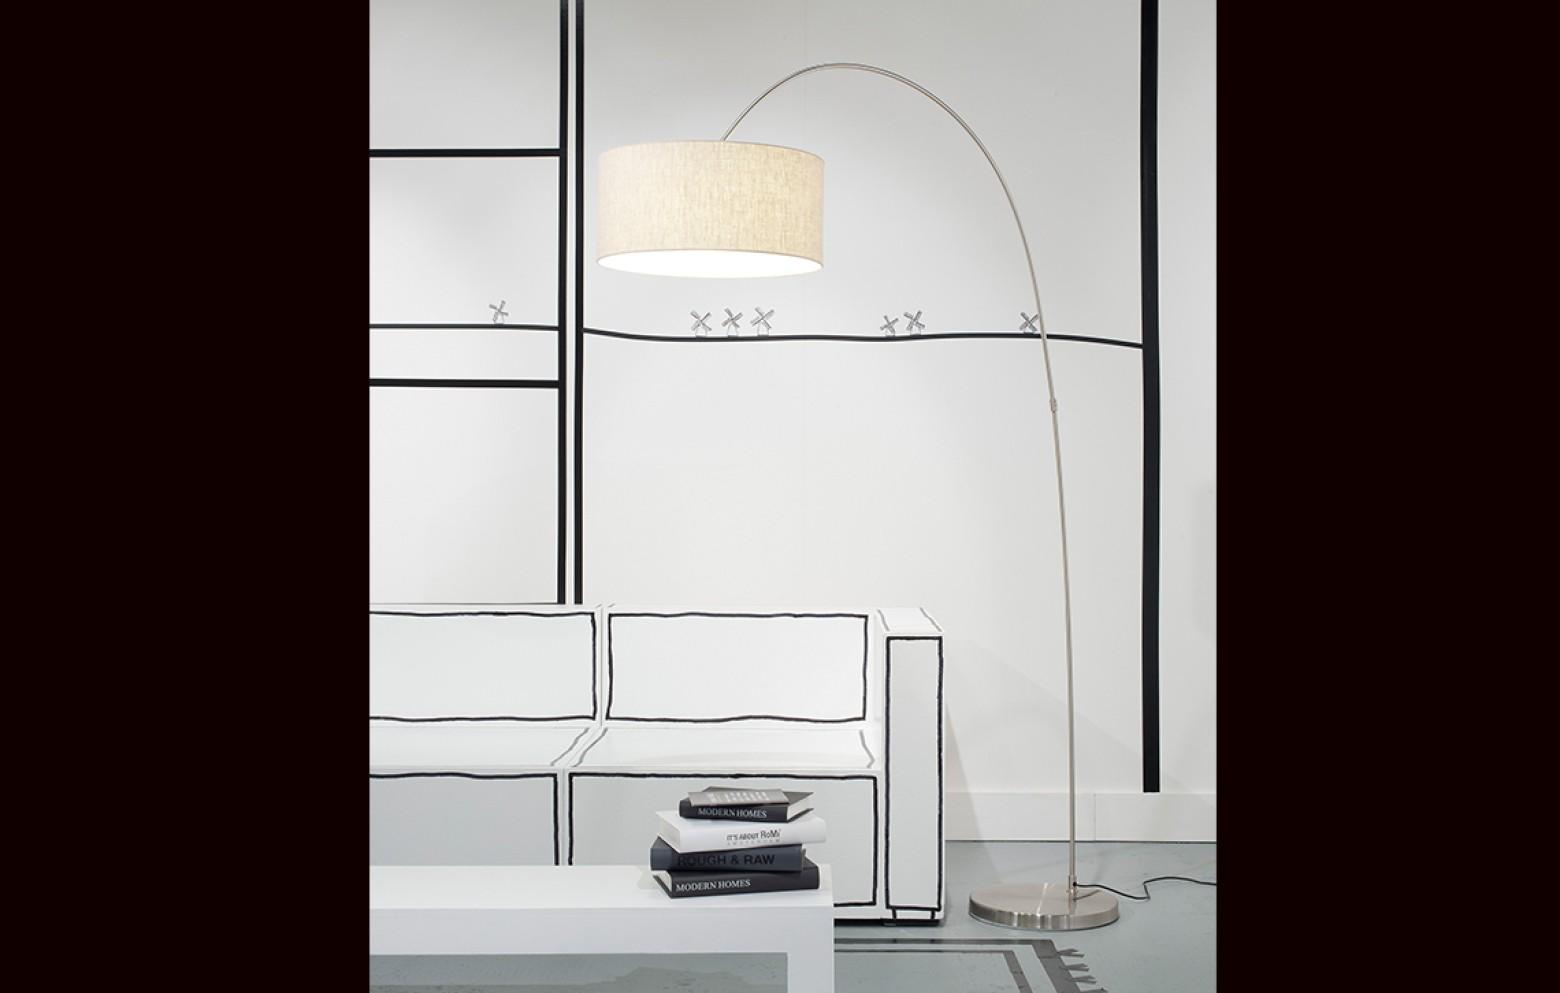 boliv stehleuchte lampen kleinm bel accessoires who 39 s perfect. Black Bedroom Furniture Sets. Home Design Ideas